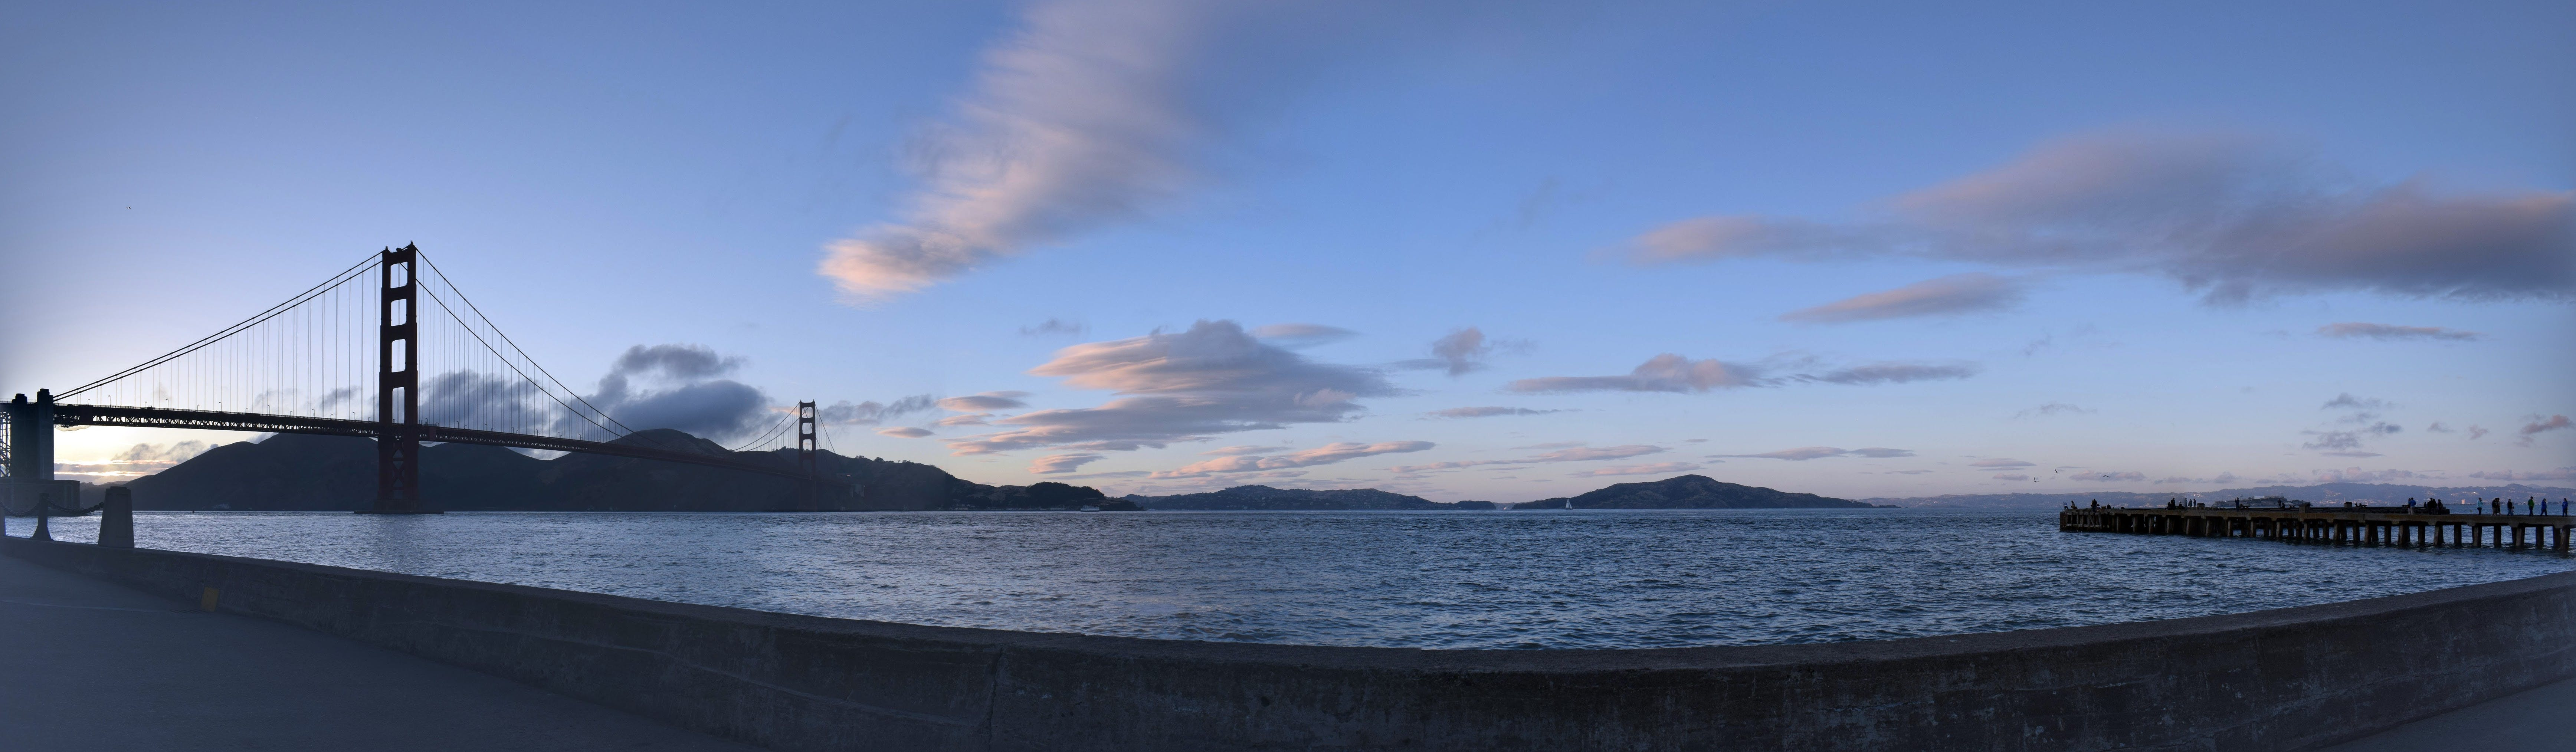 Free stock photo of background, blue skies, blue sky, bridge